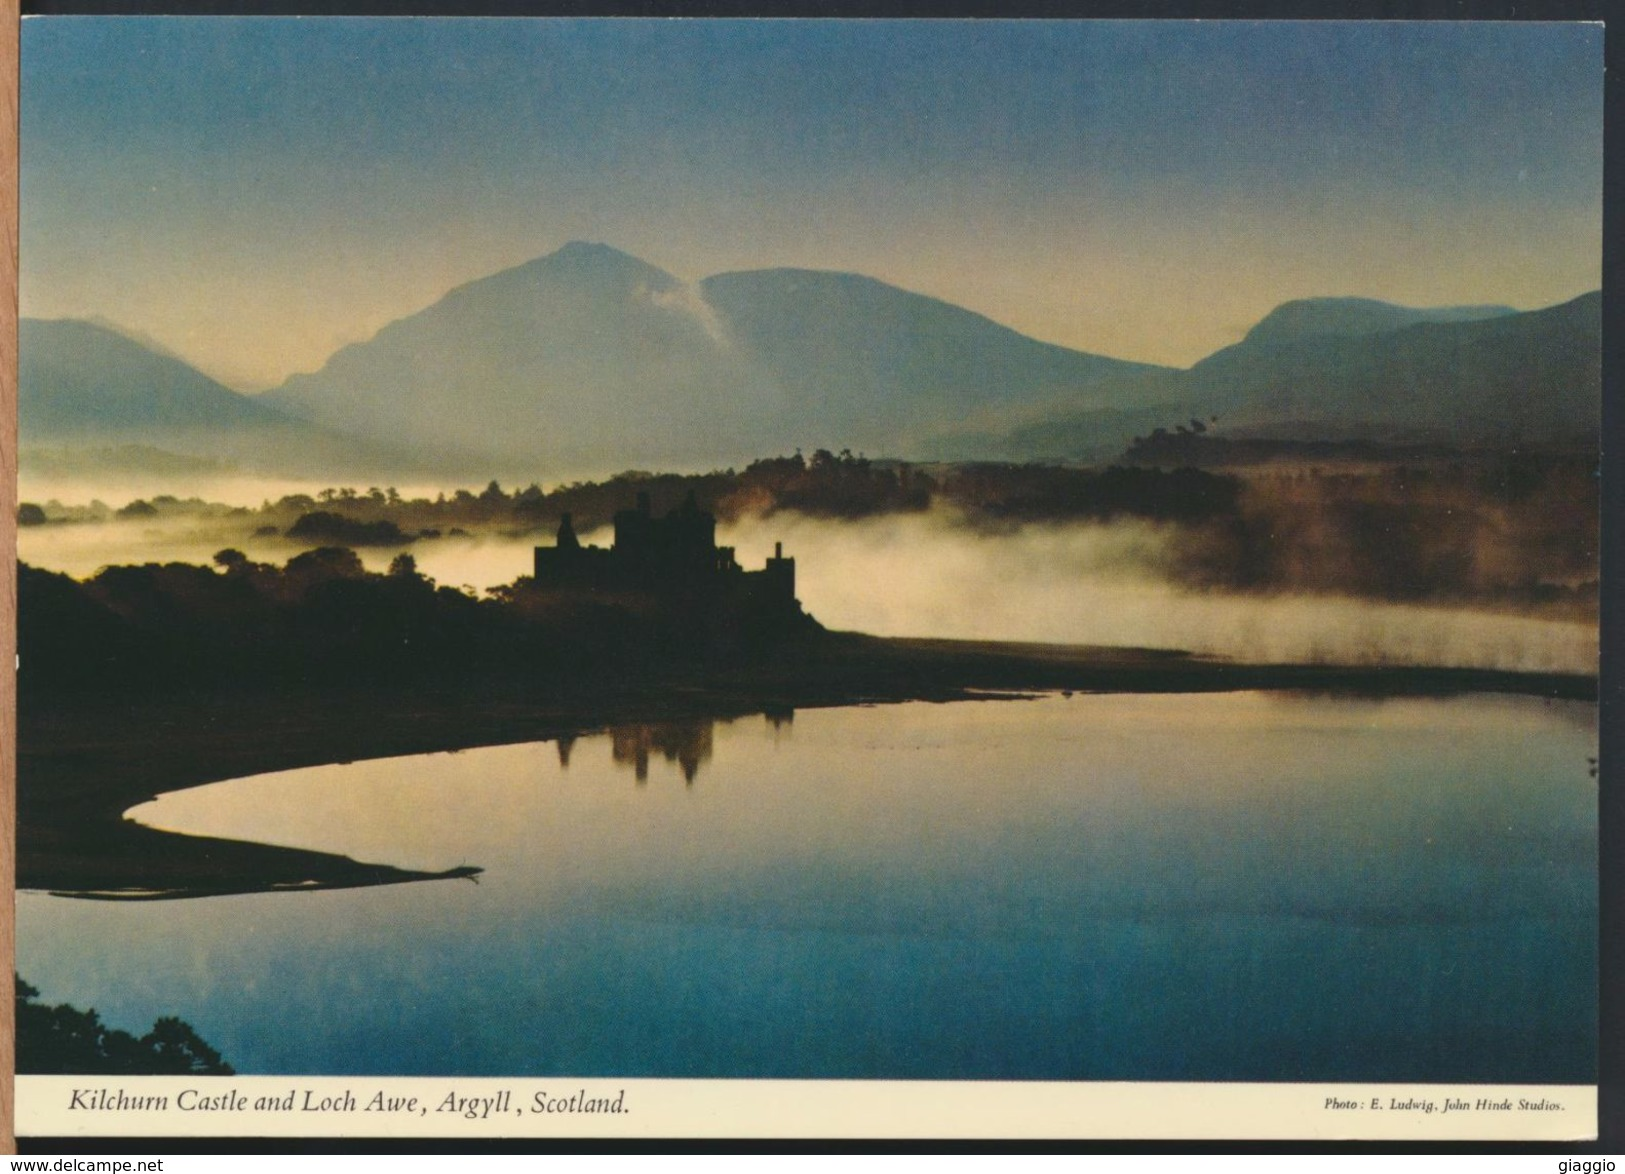 °°° 8986 - SCOTLAND - KILCHURN CASTLE AND LOCH AWE °°° - Argyllshire